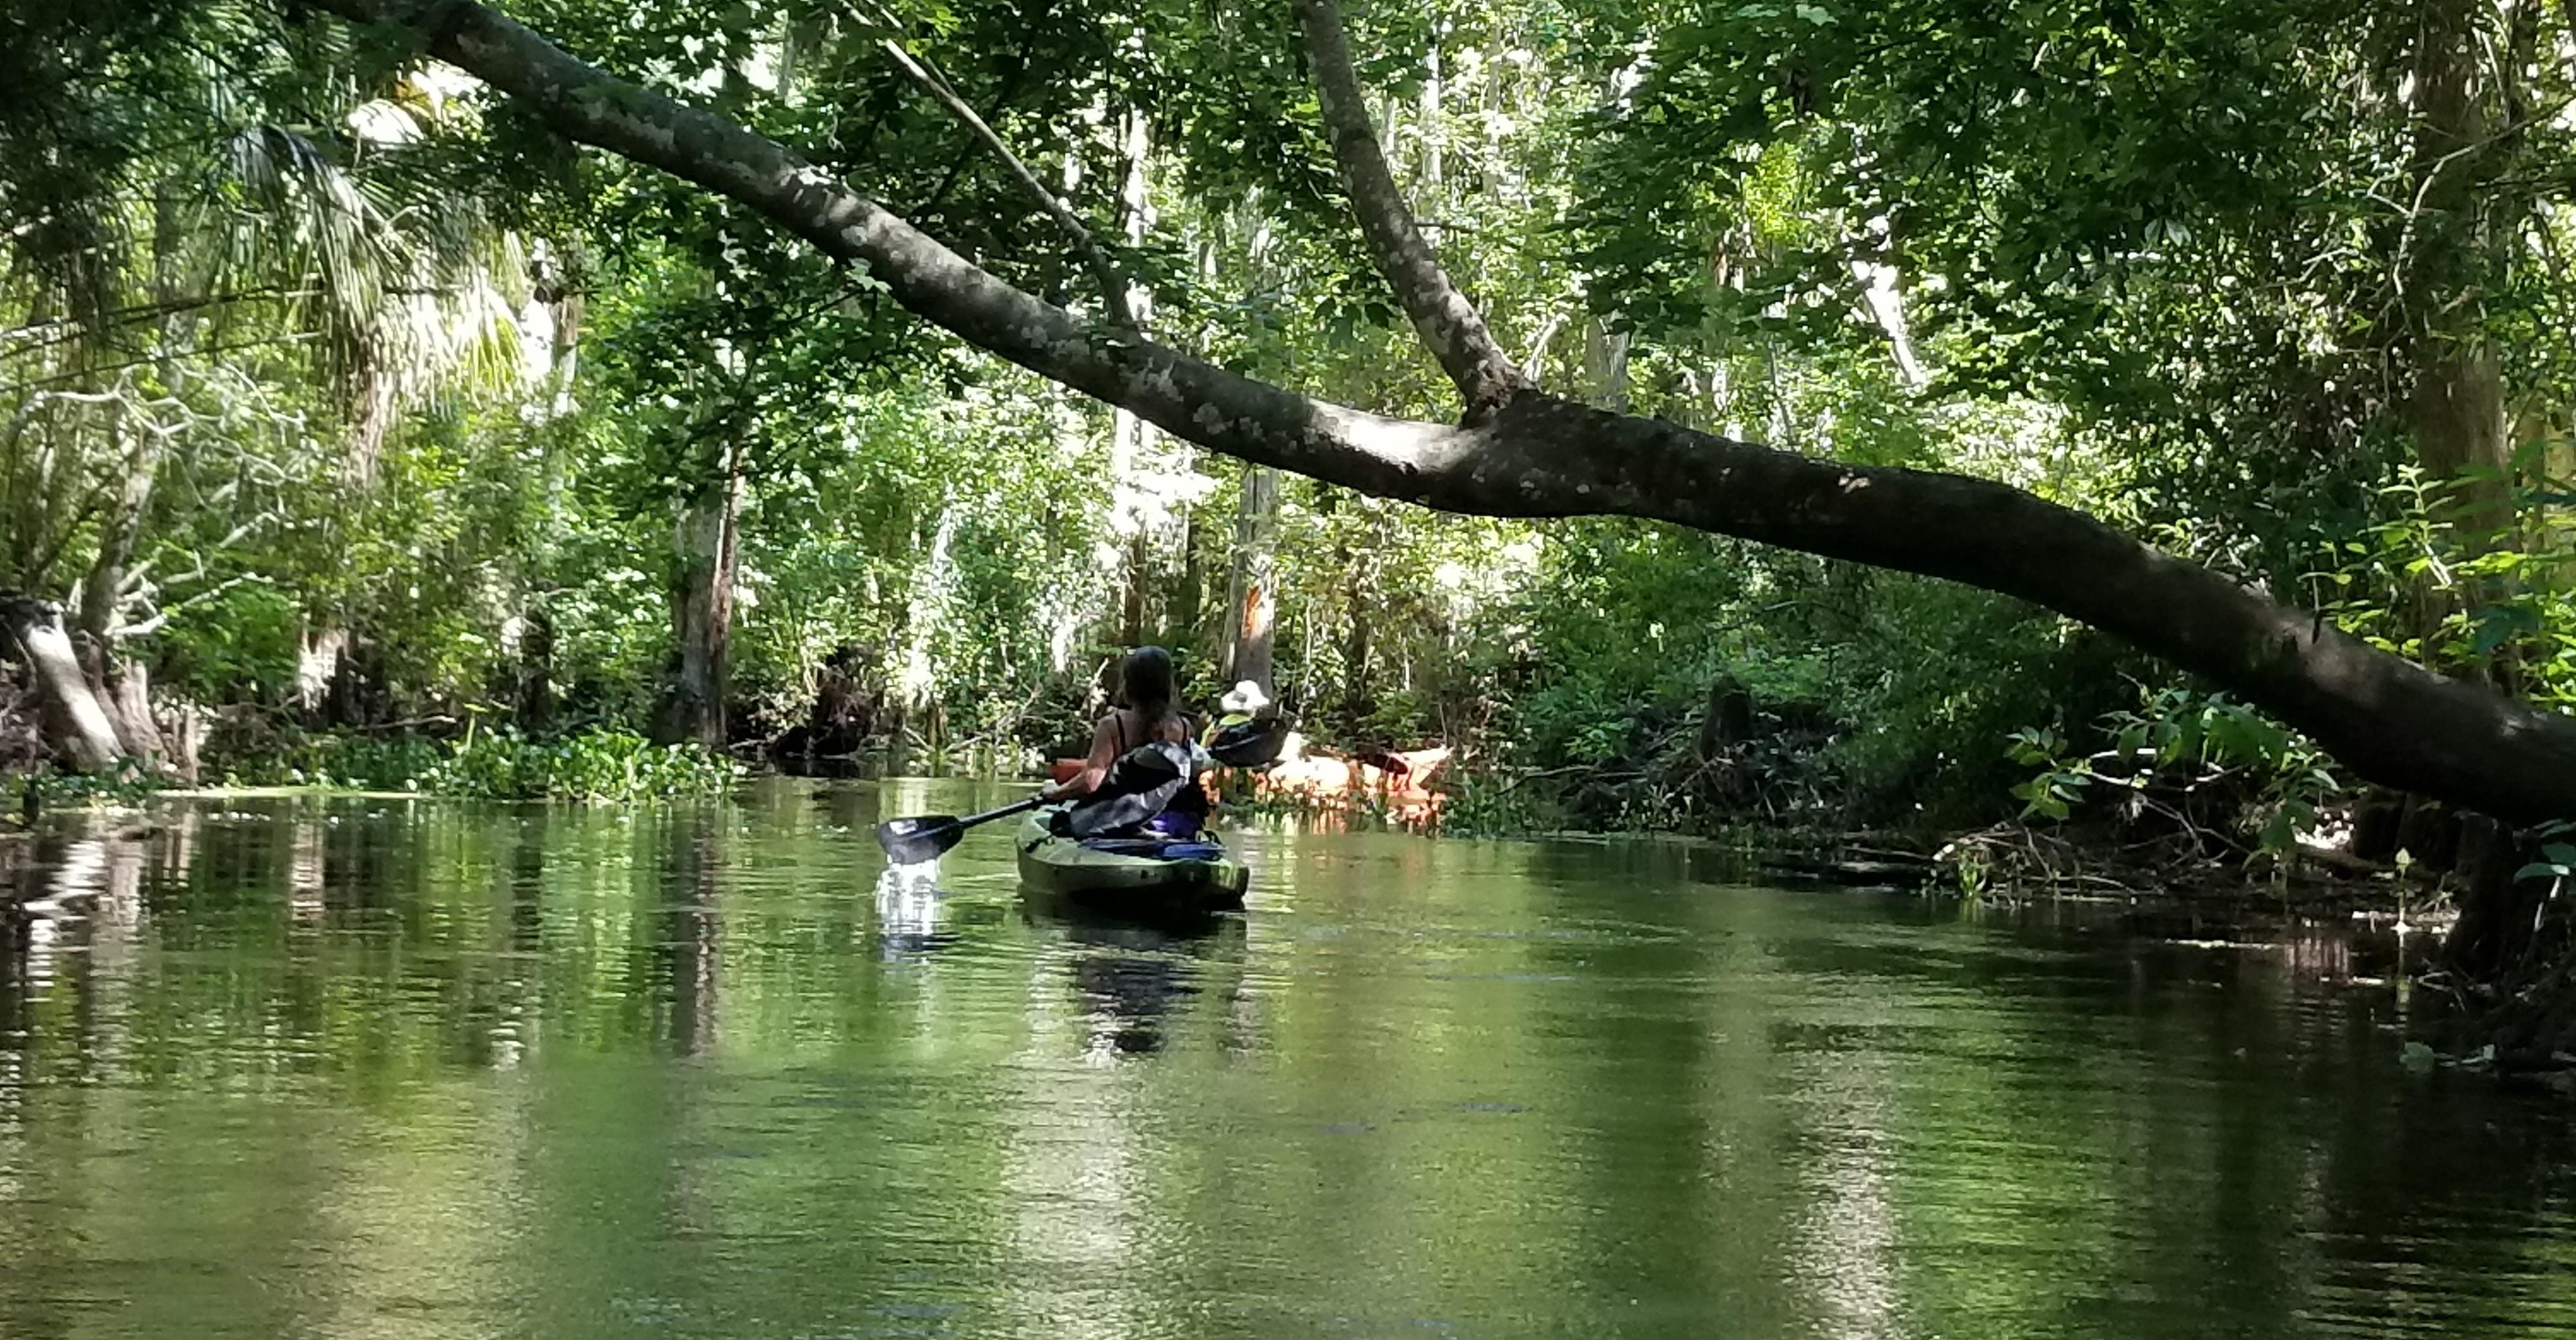 florida kayaking adventures, tours, eco-